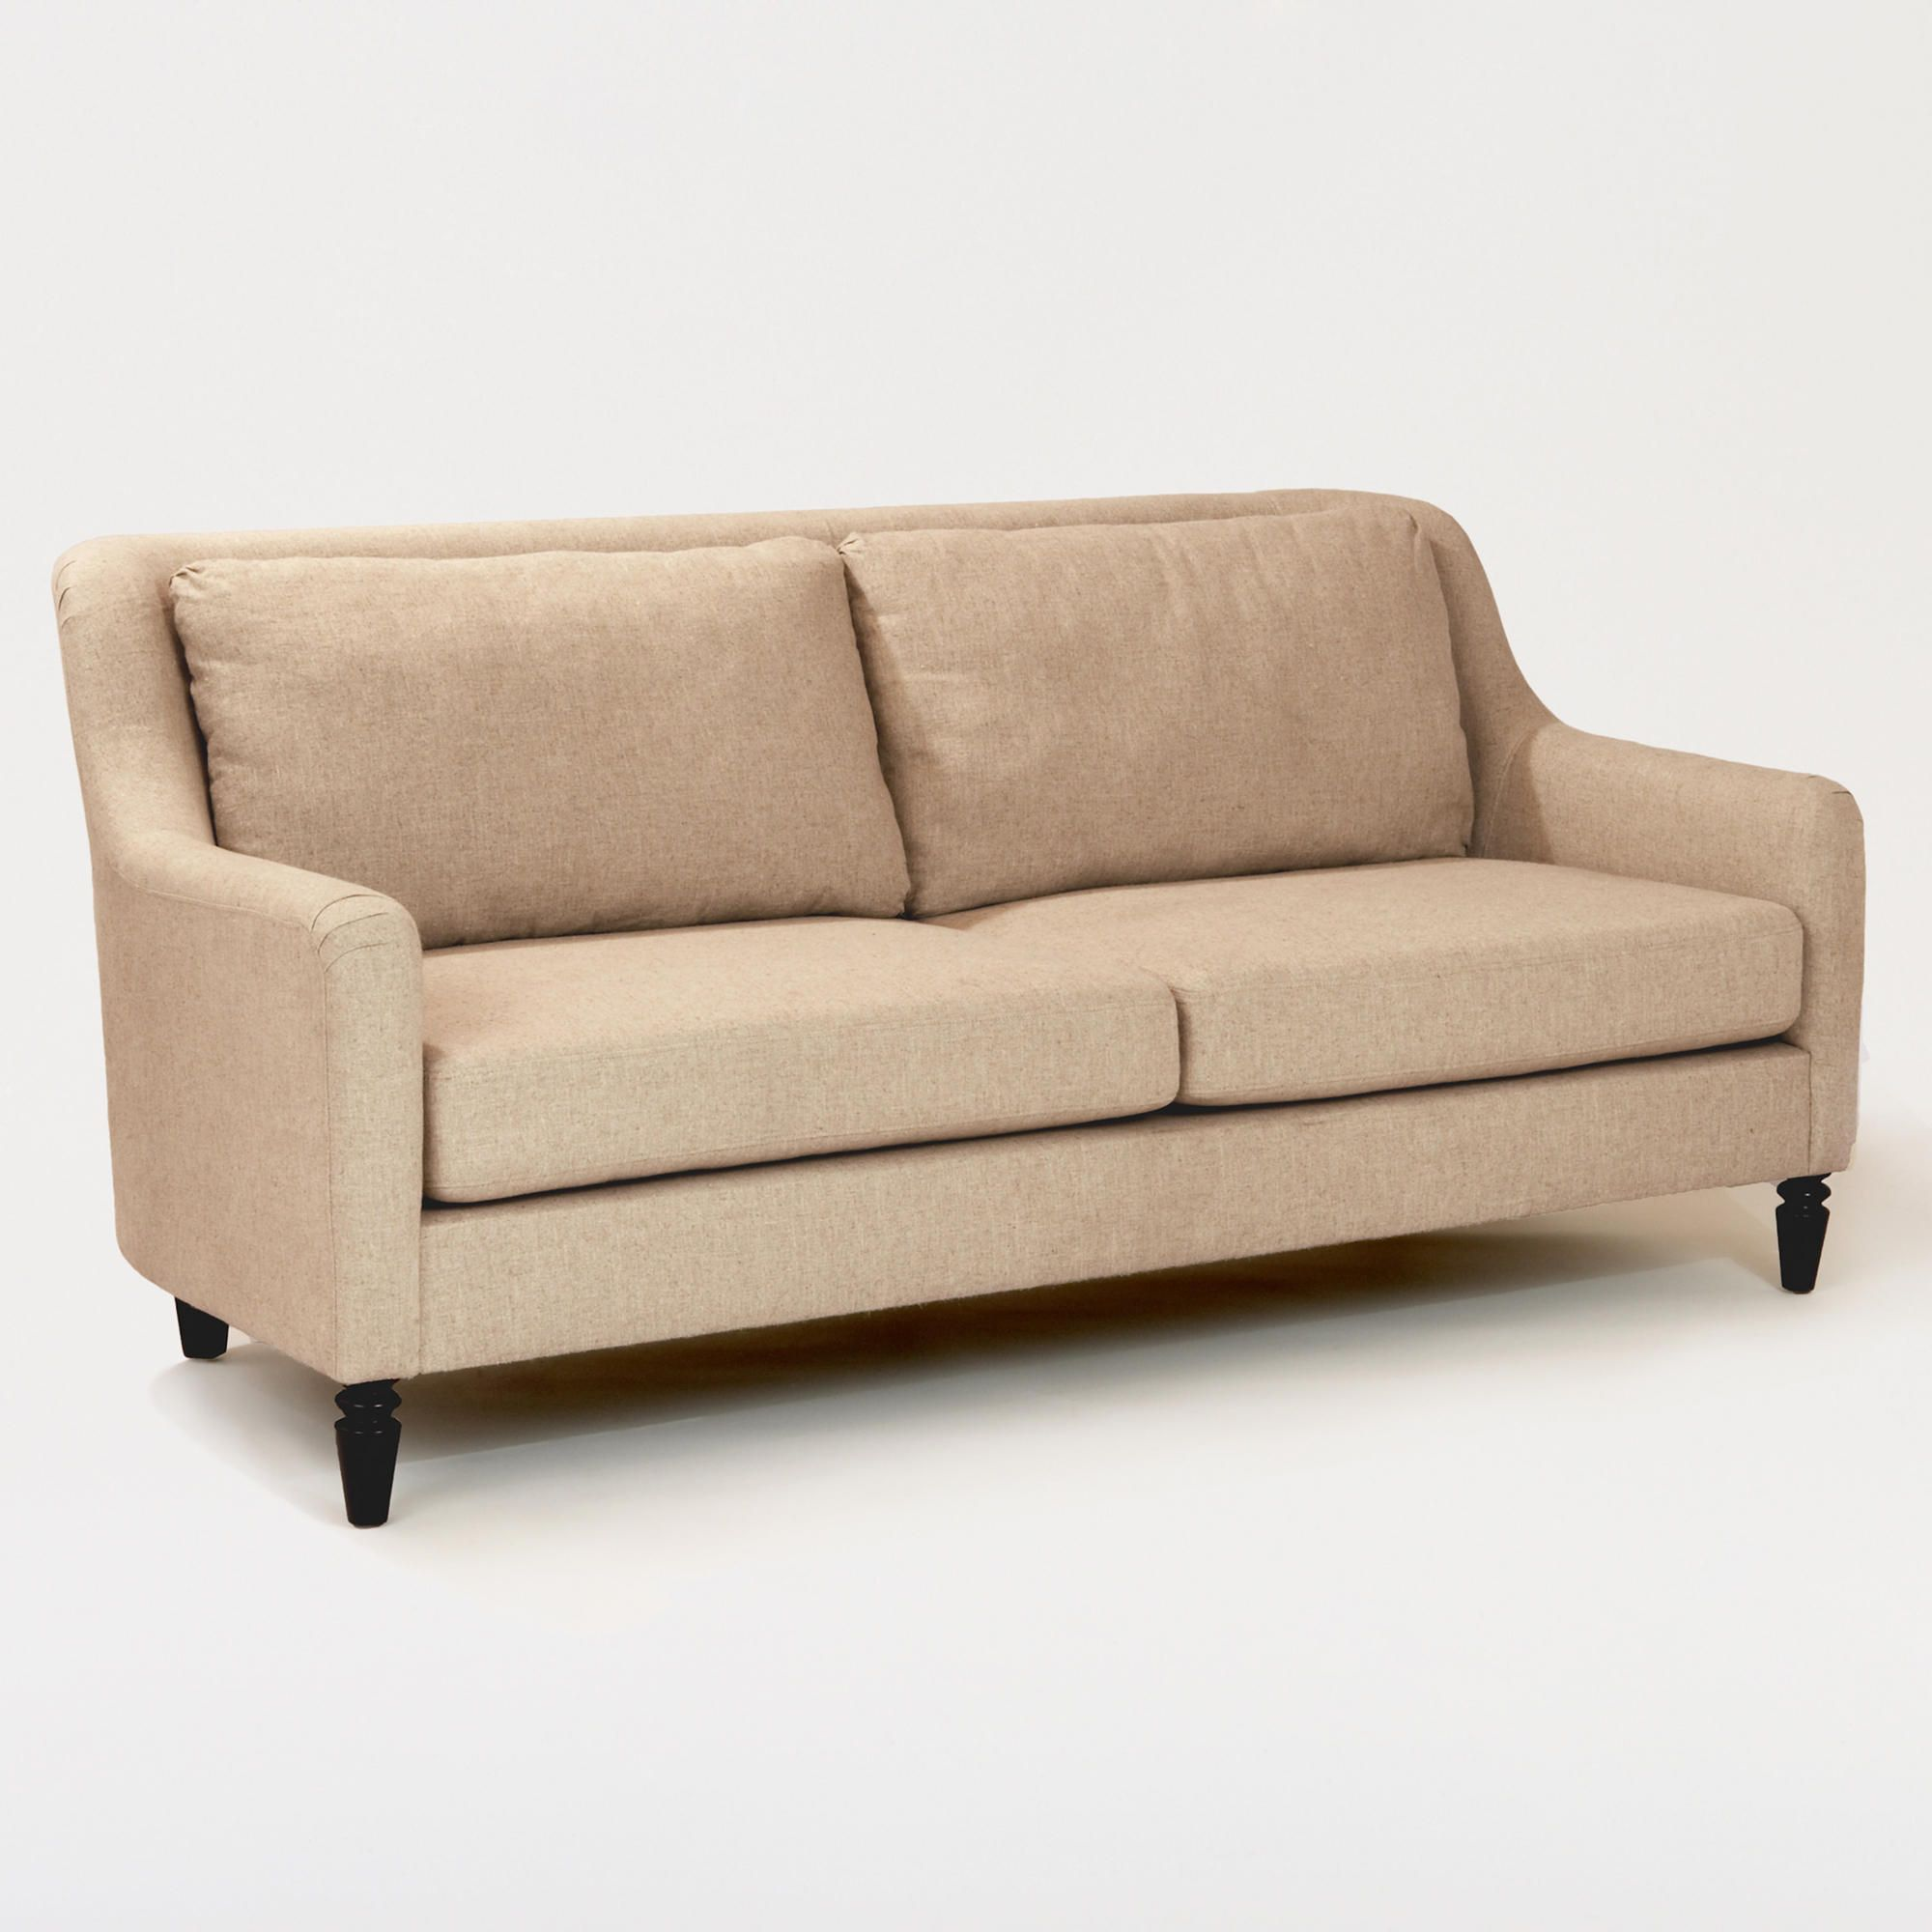 Lindley Sofa World Market 599 99 Not Sofa Bed Sofa